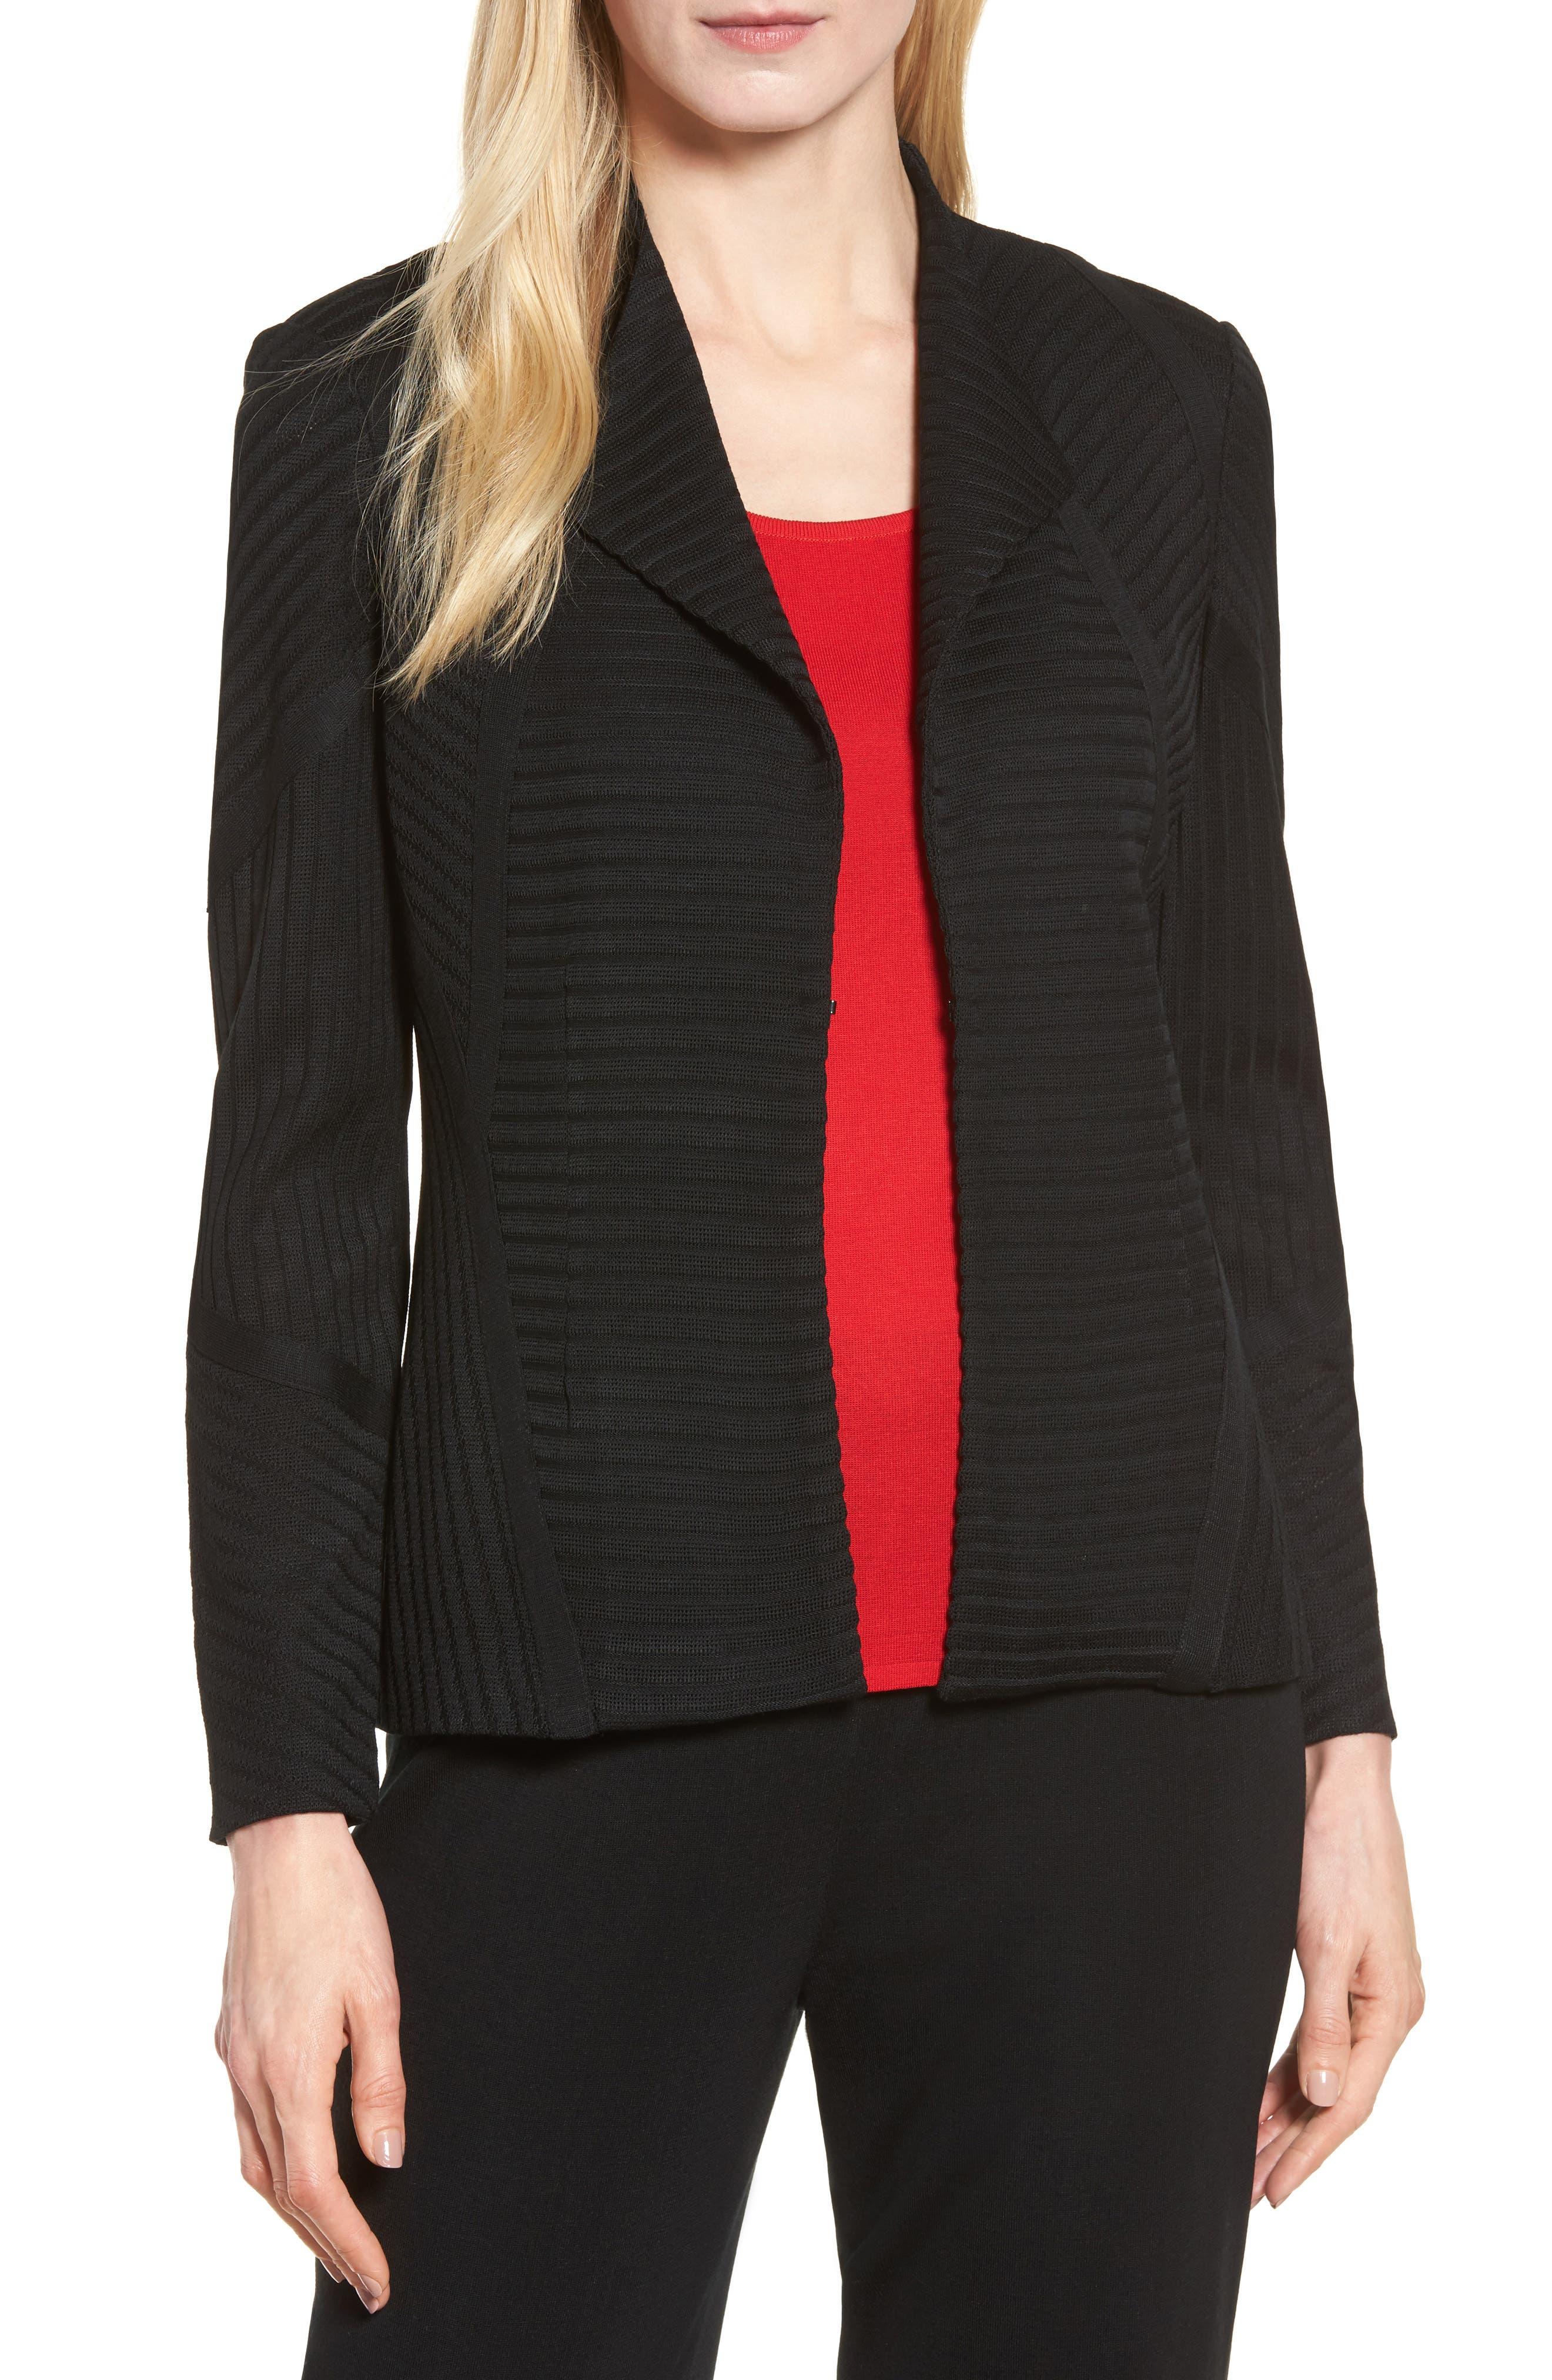 Alternate Image 1 Selected - Ming Wang Striped Knit Jacket